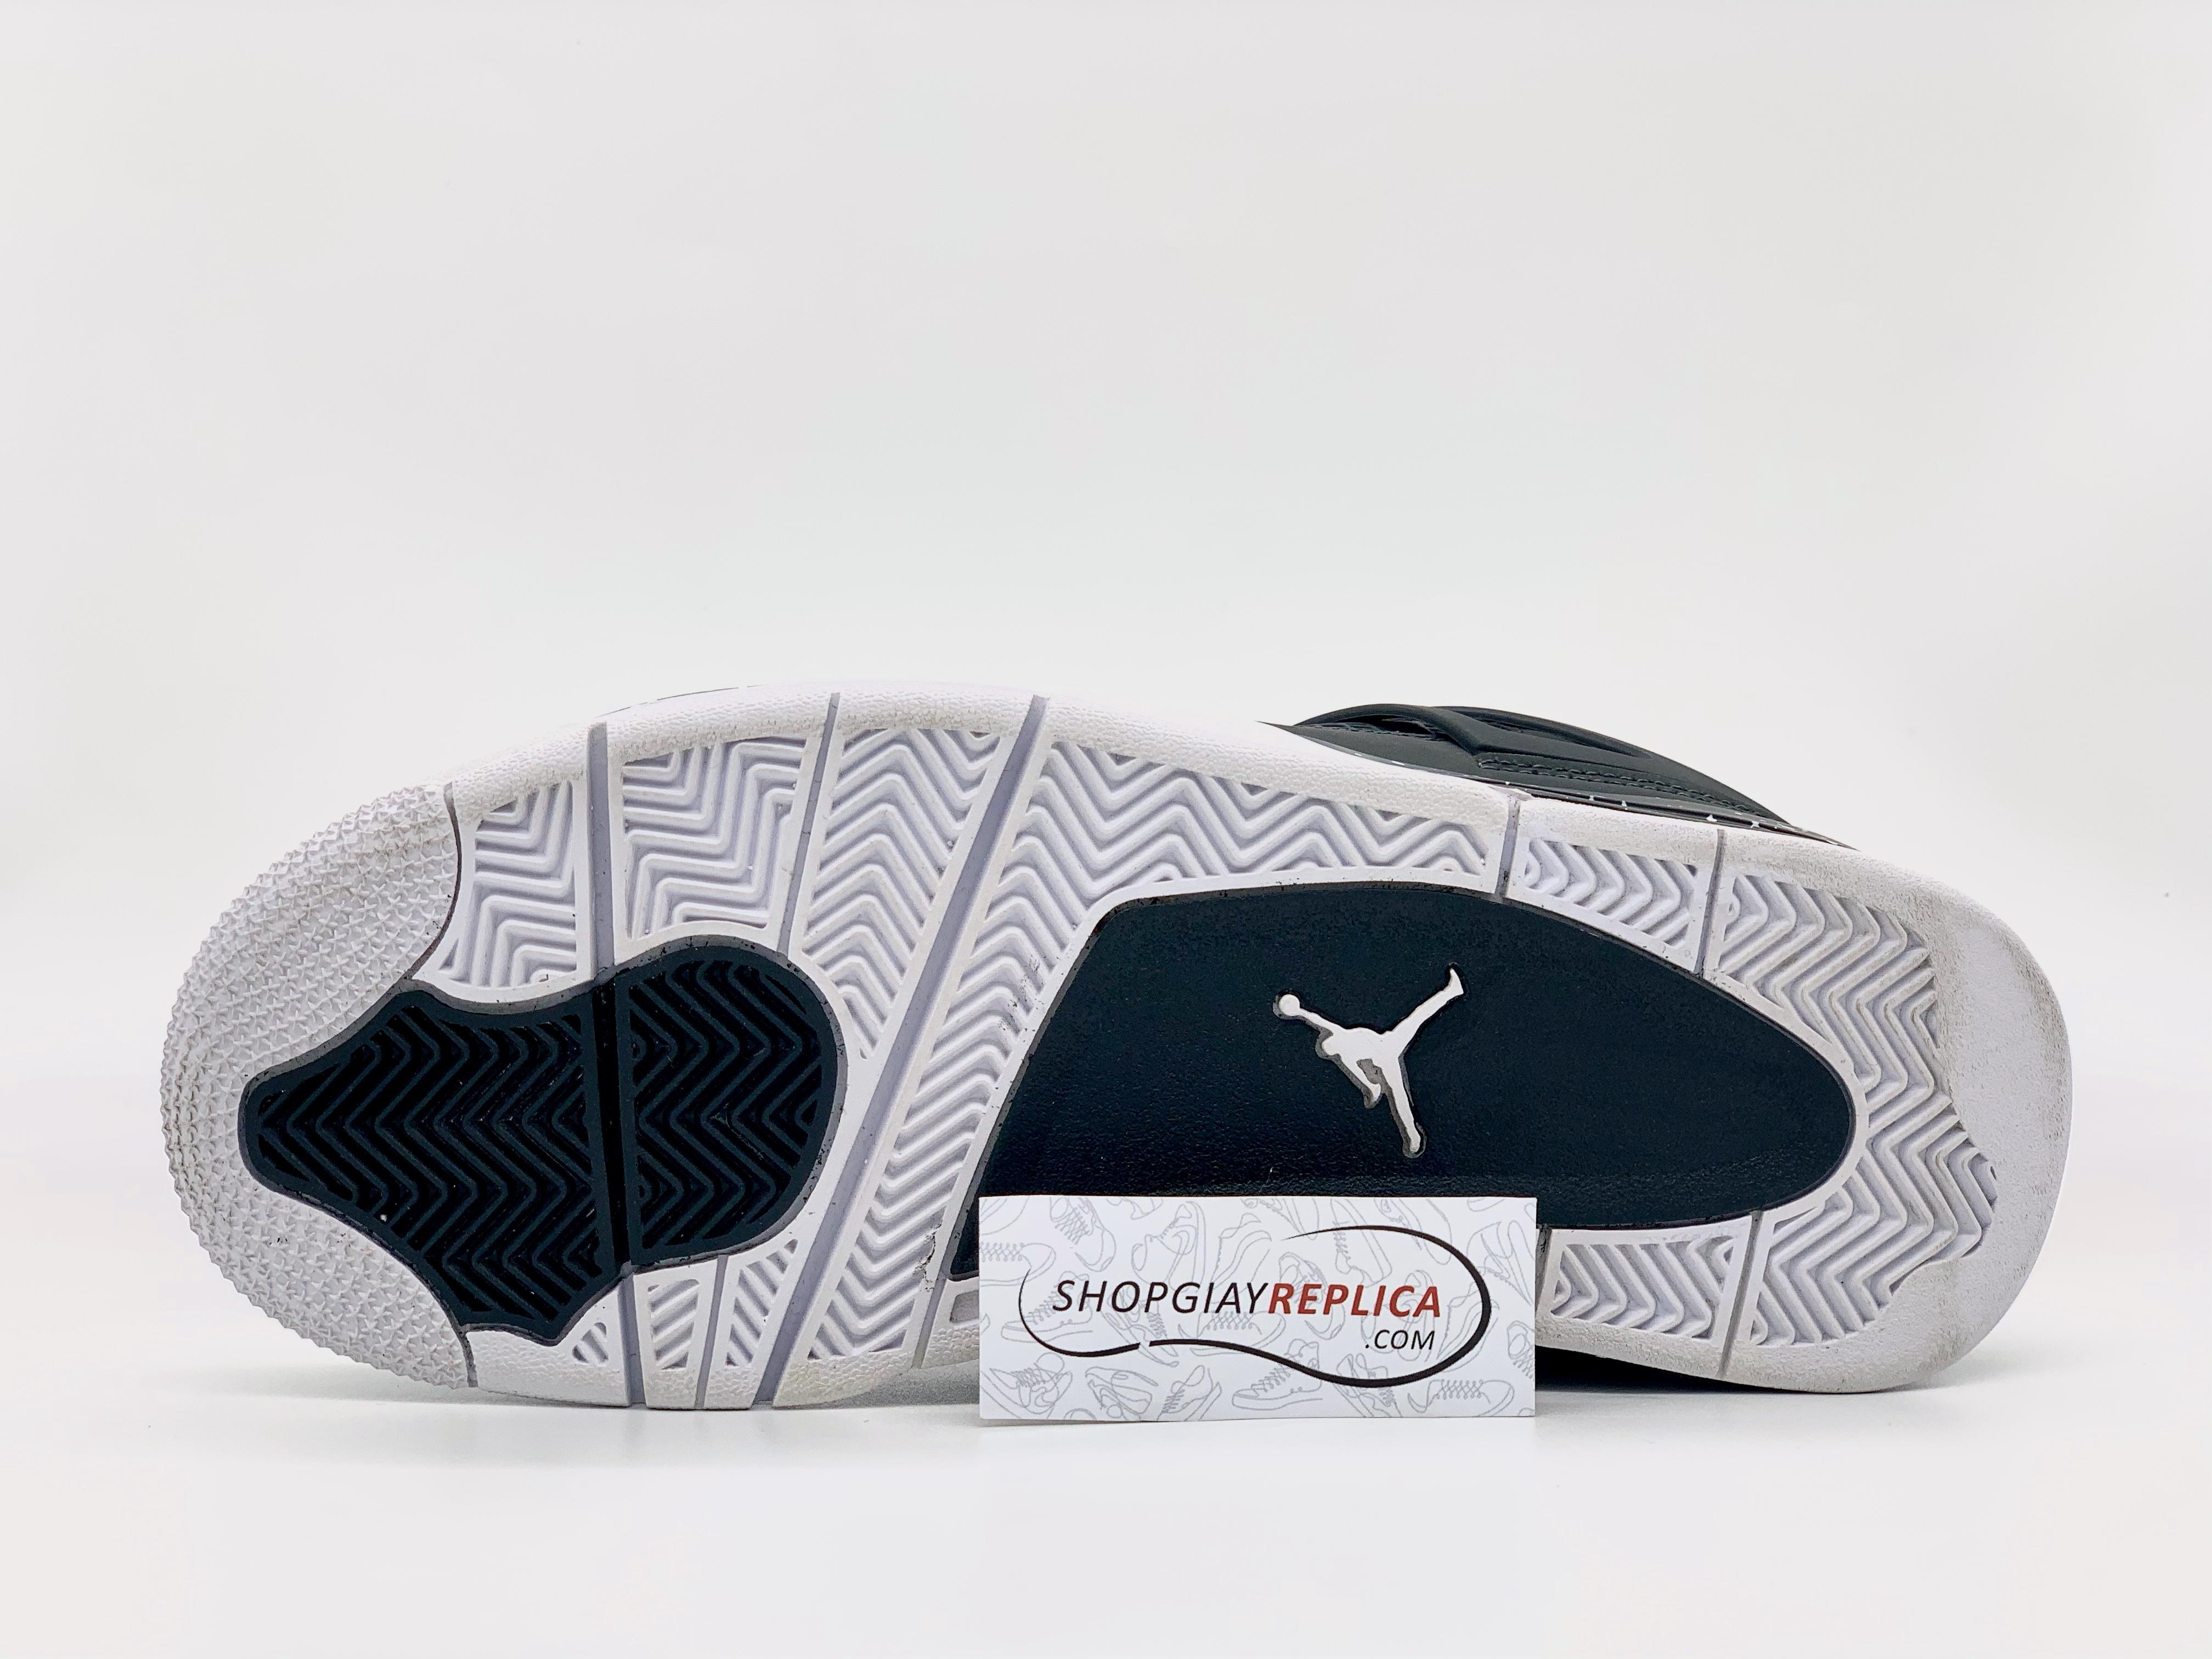 Giày Nike Air Jordan 4 Retro Fear Pack replica